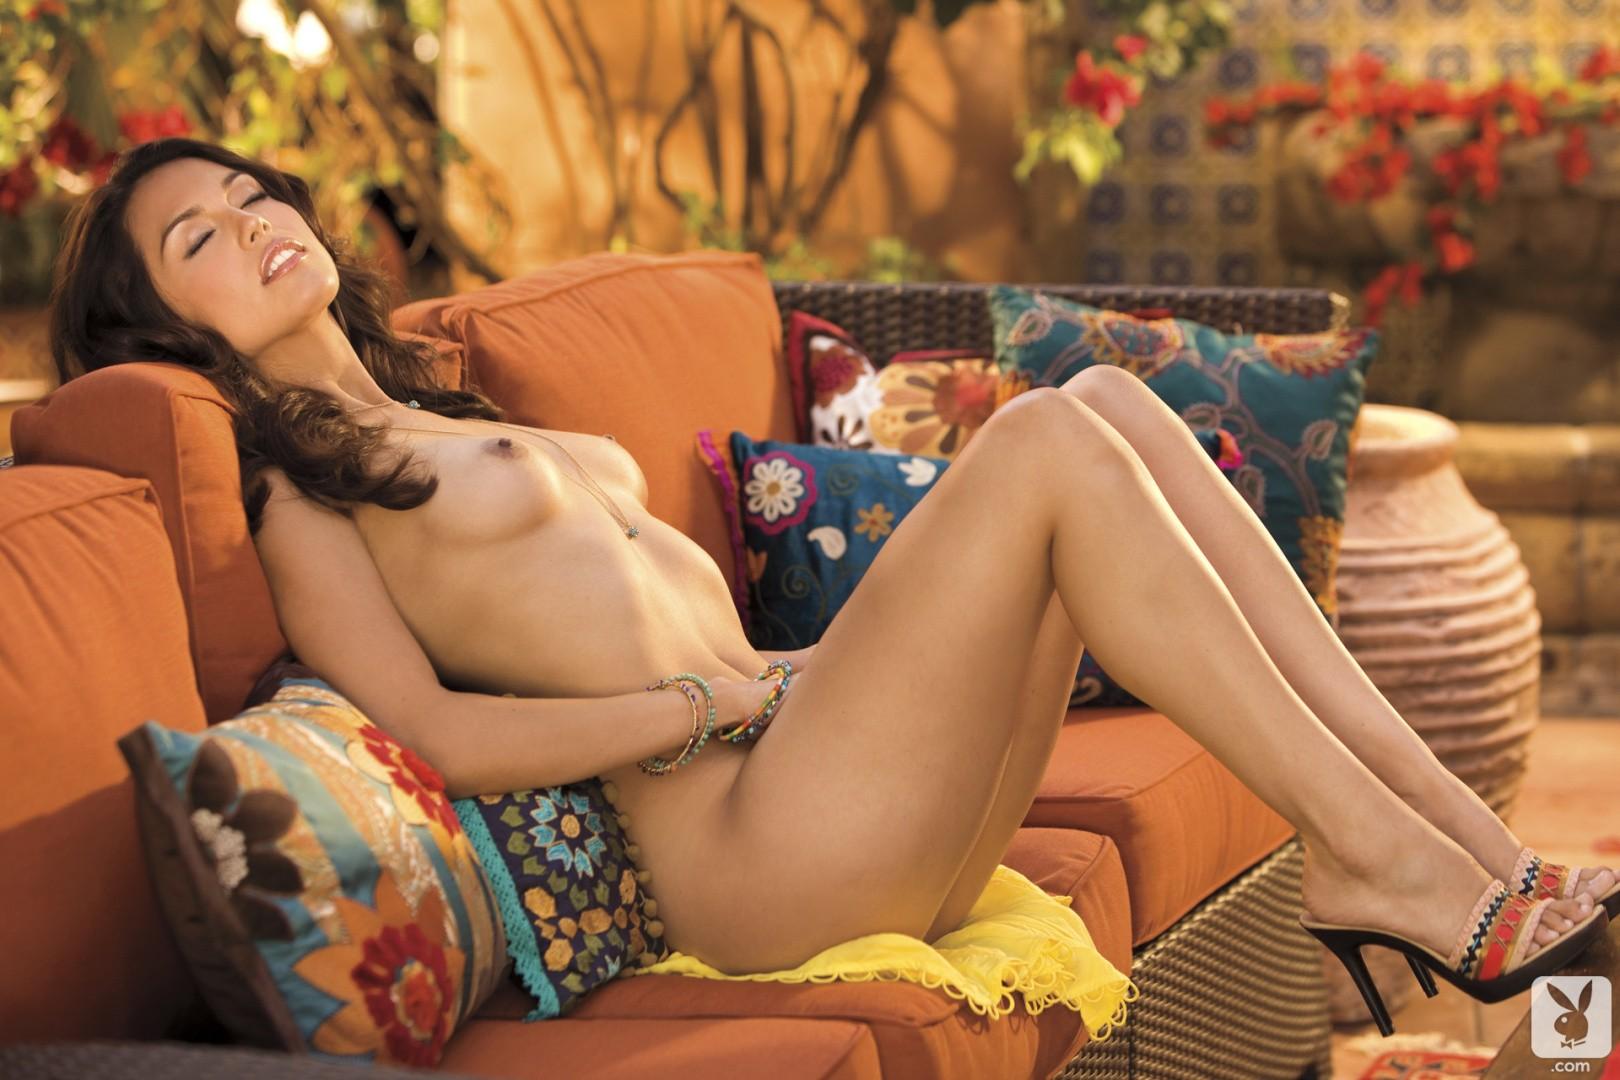 Raquel Pomplun sin censura 3